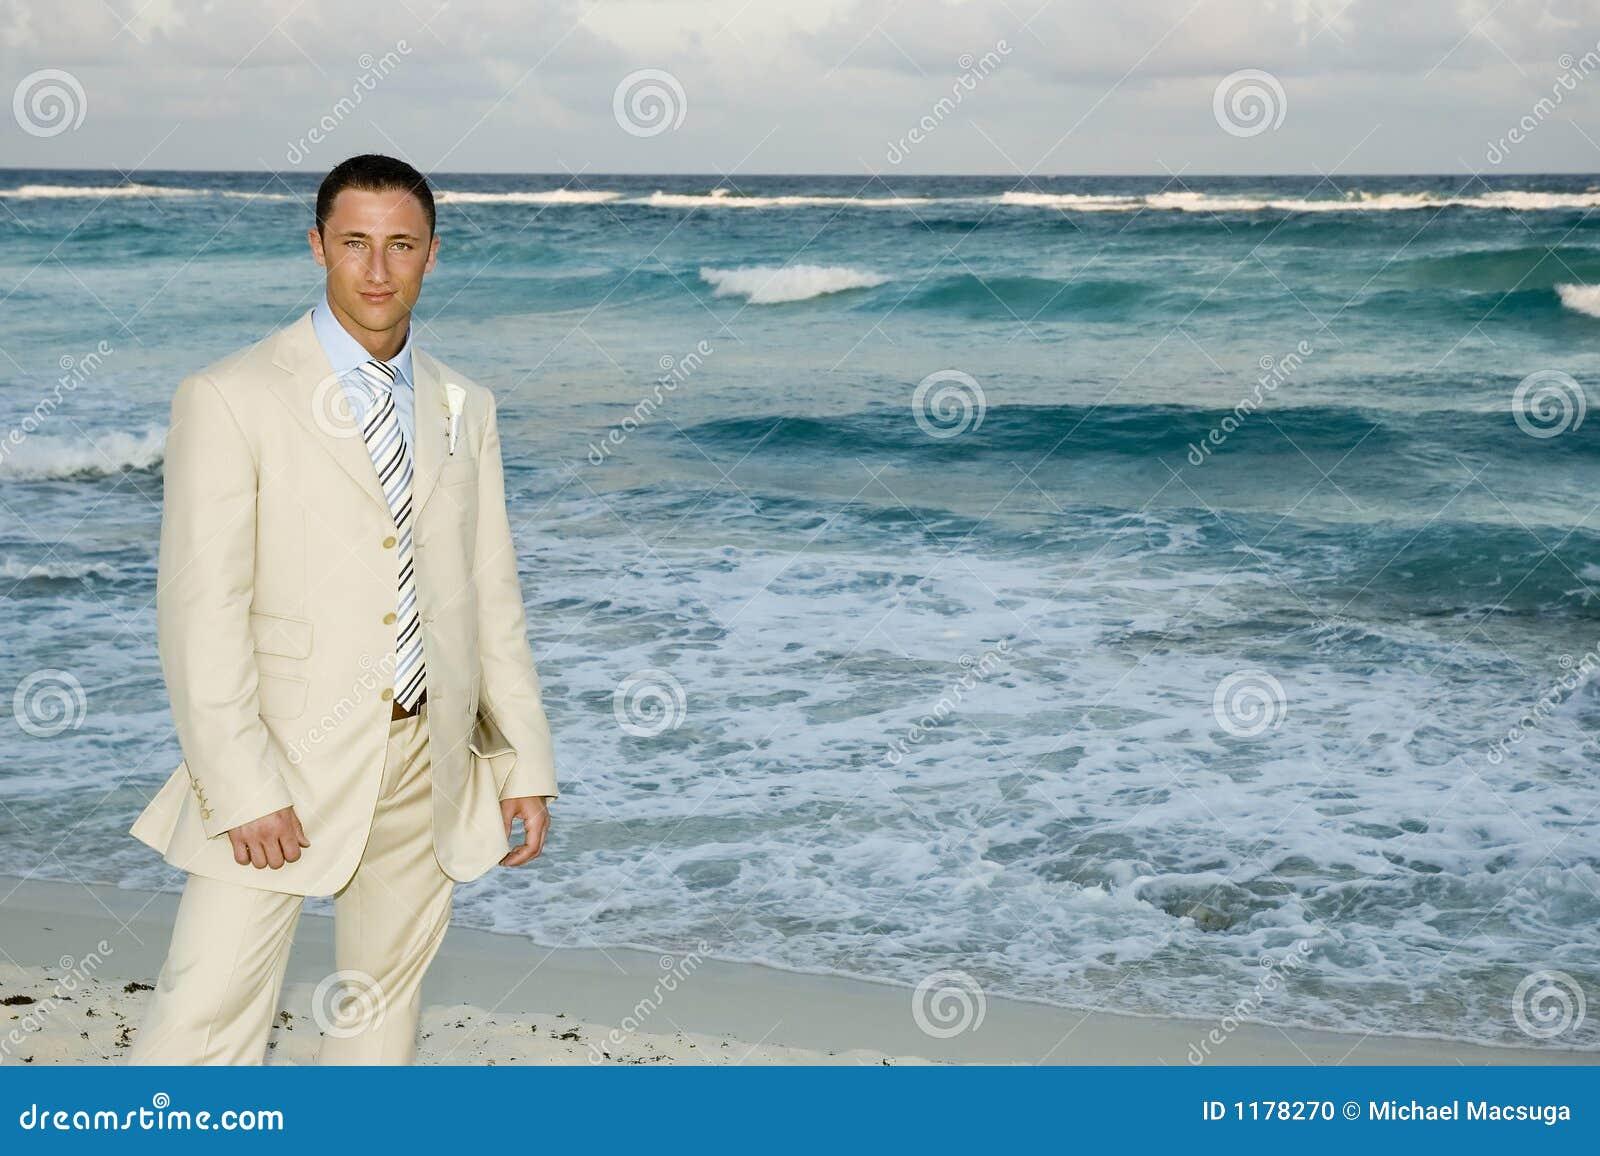 Groom caribbean пляжа представляя венчание